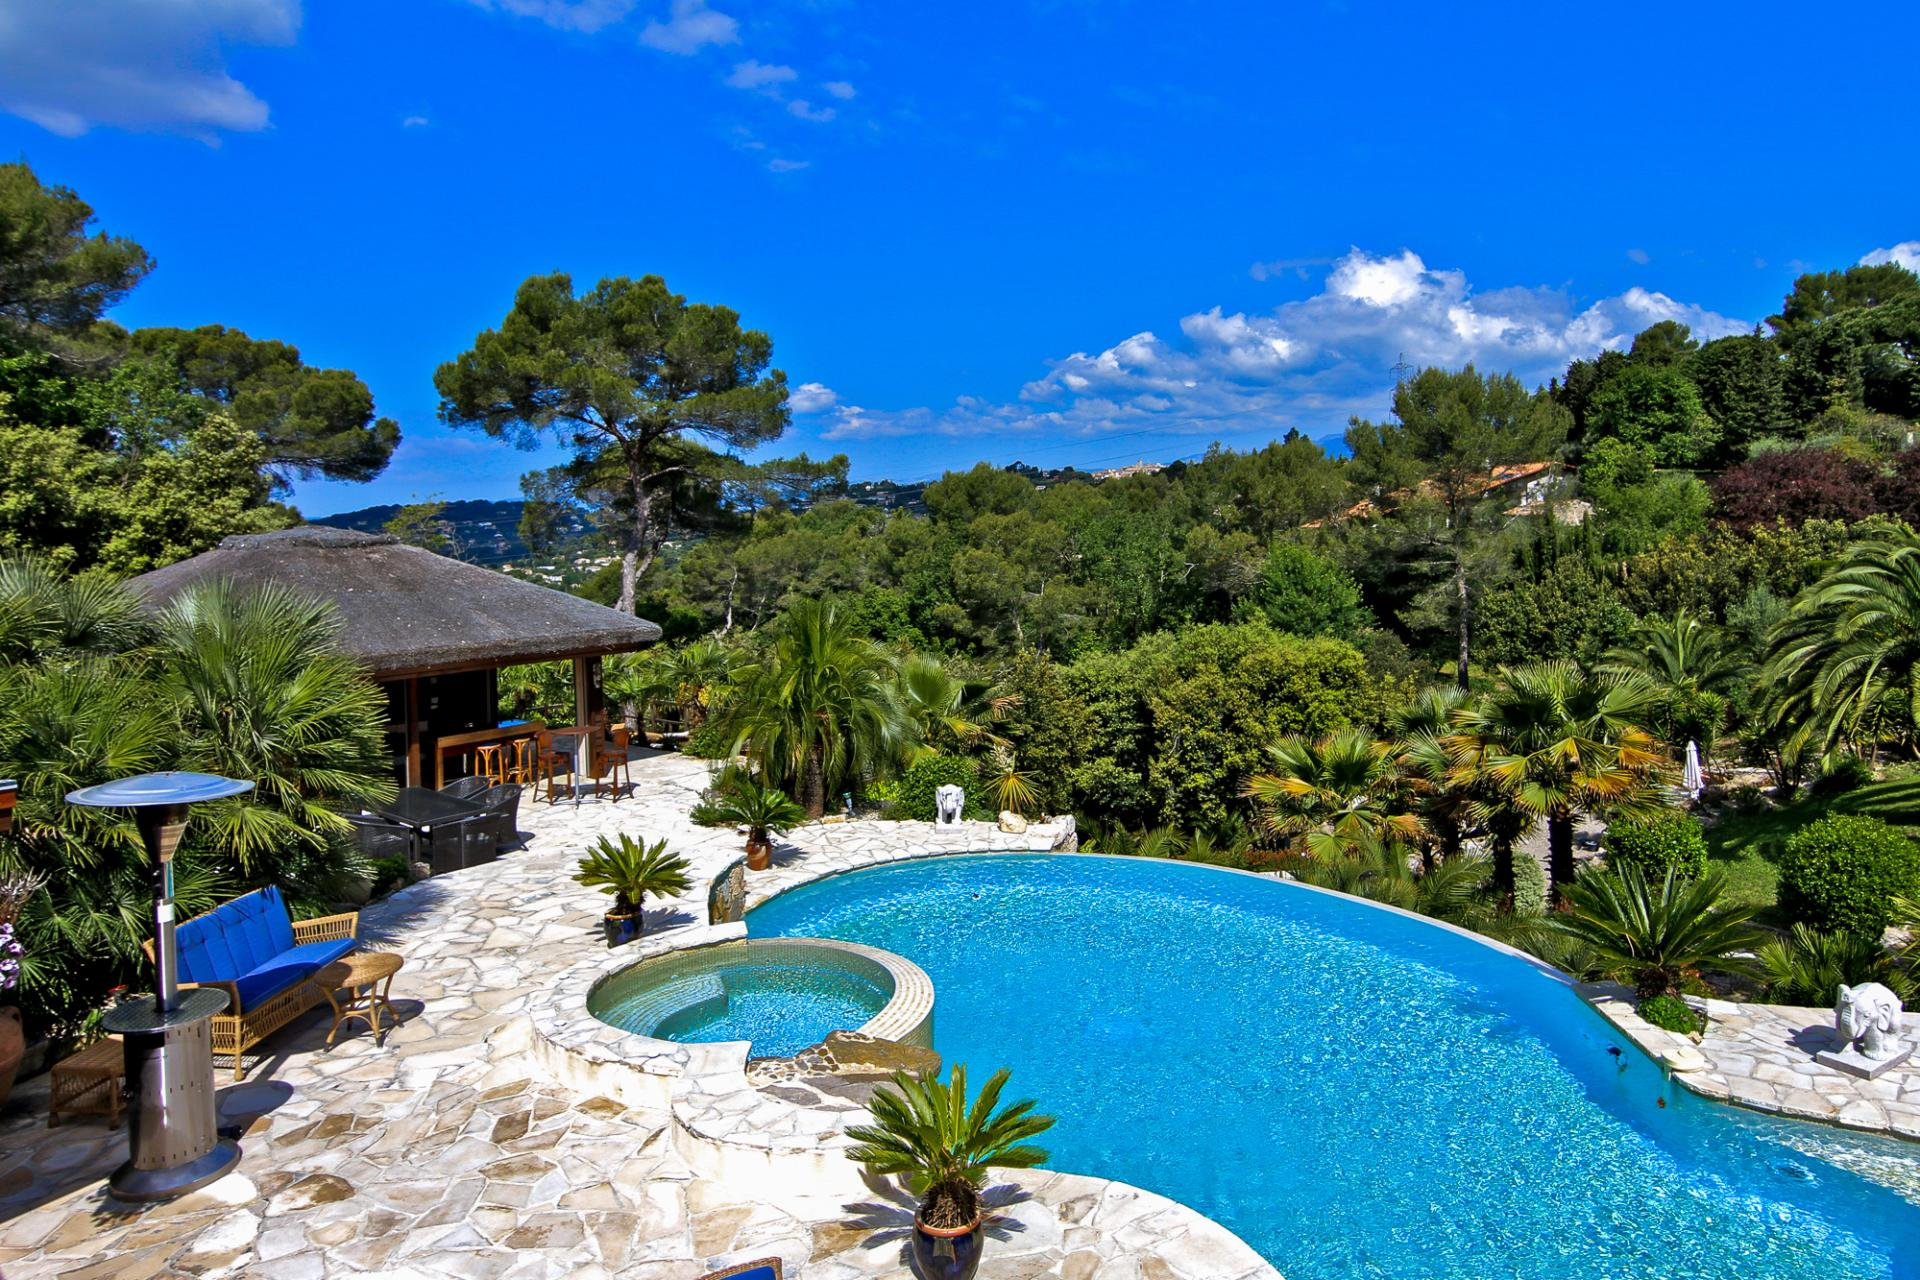 Villa, Pool and Grounds, La Pagode, Mougins, Cote D'Azur.